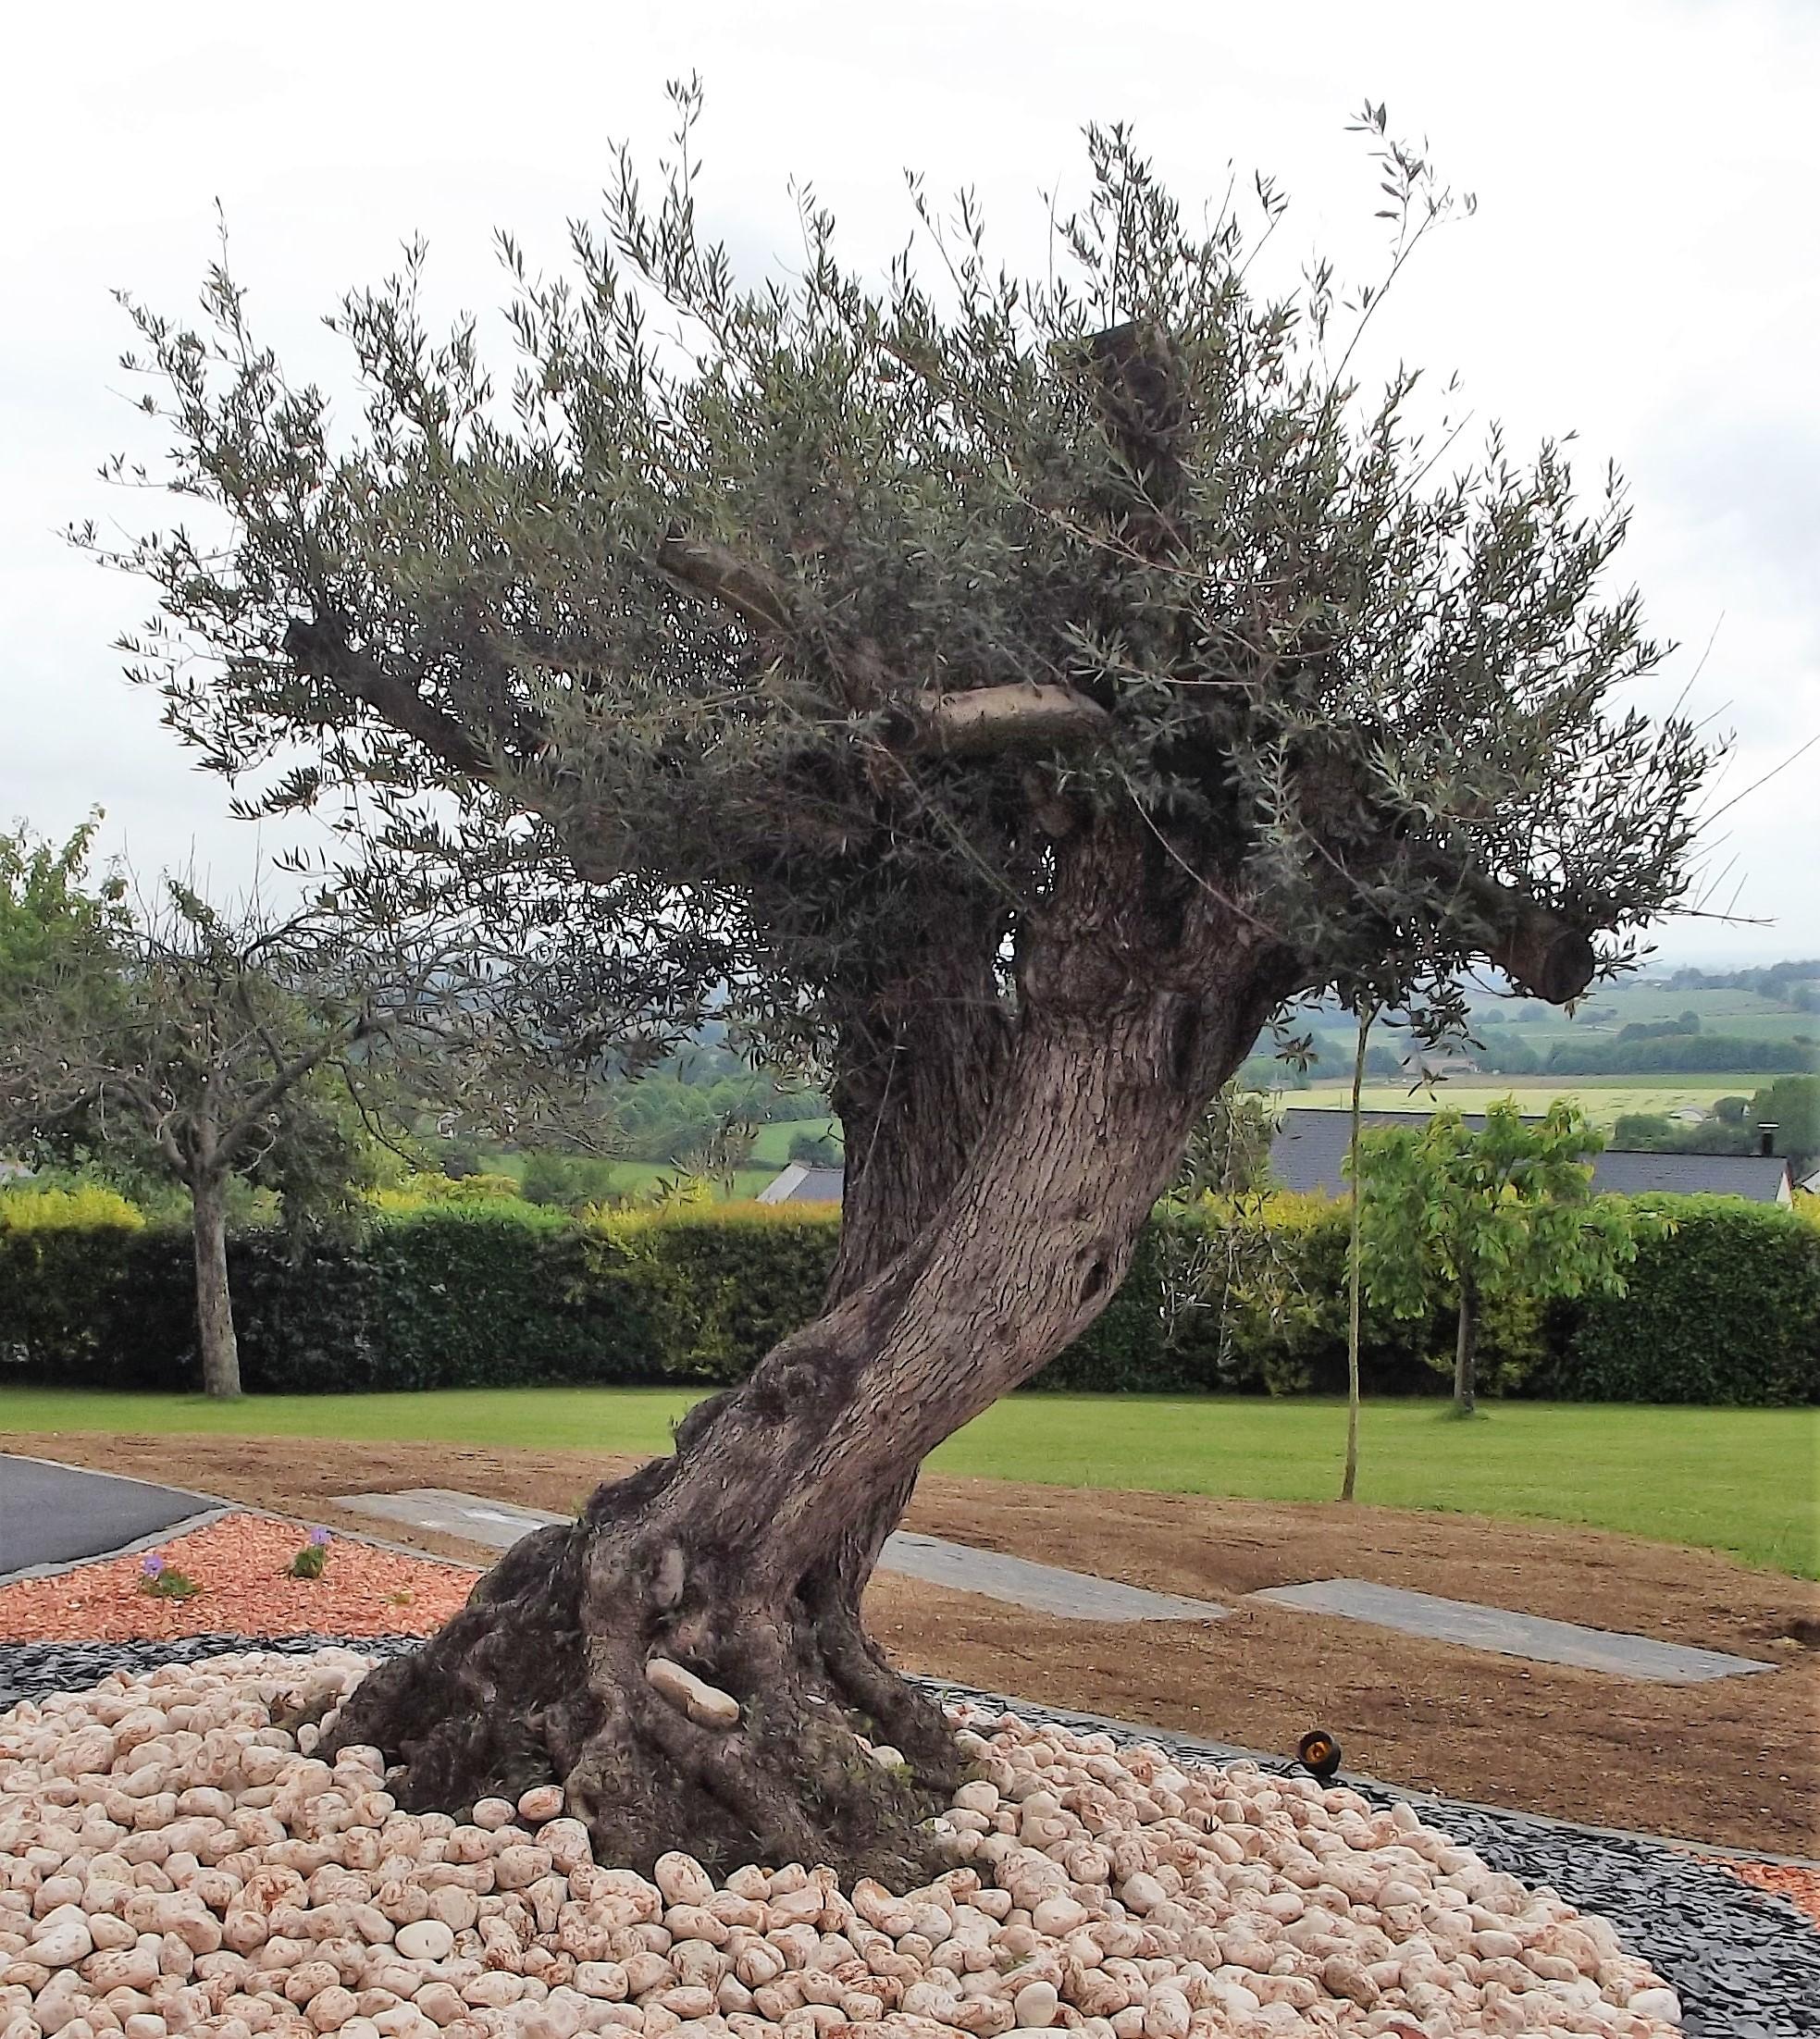 olivier paillage éclairage brochard paysage oisseau